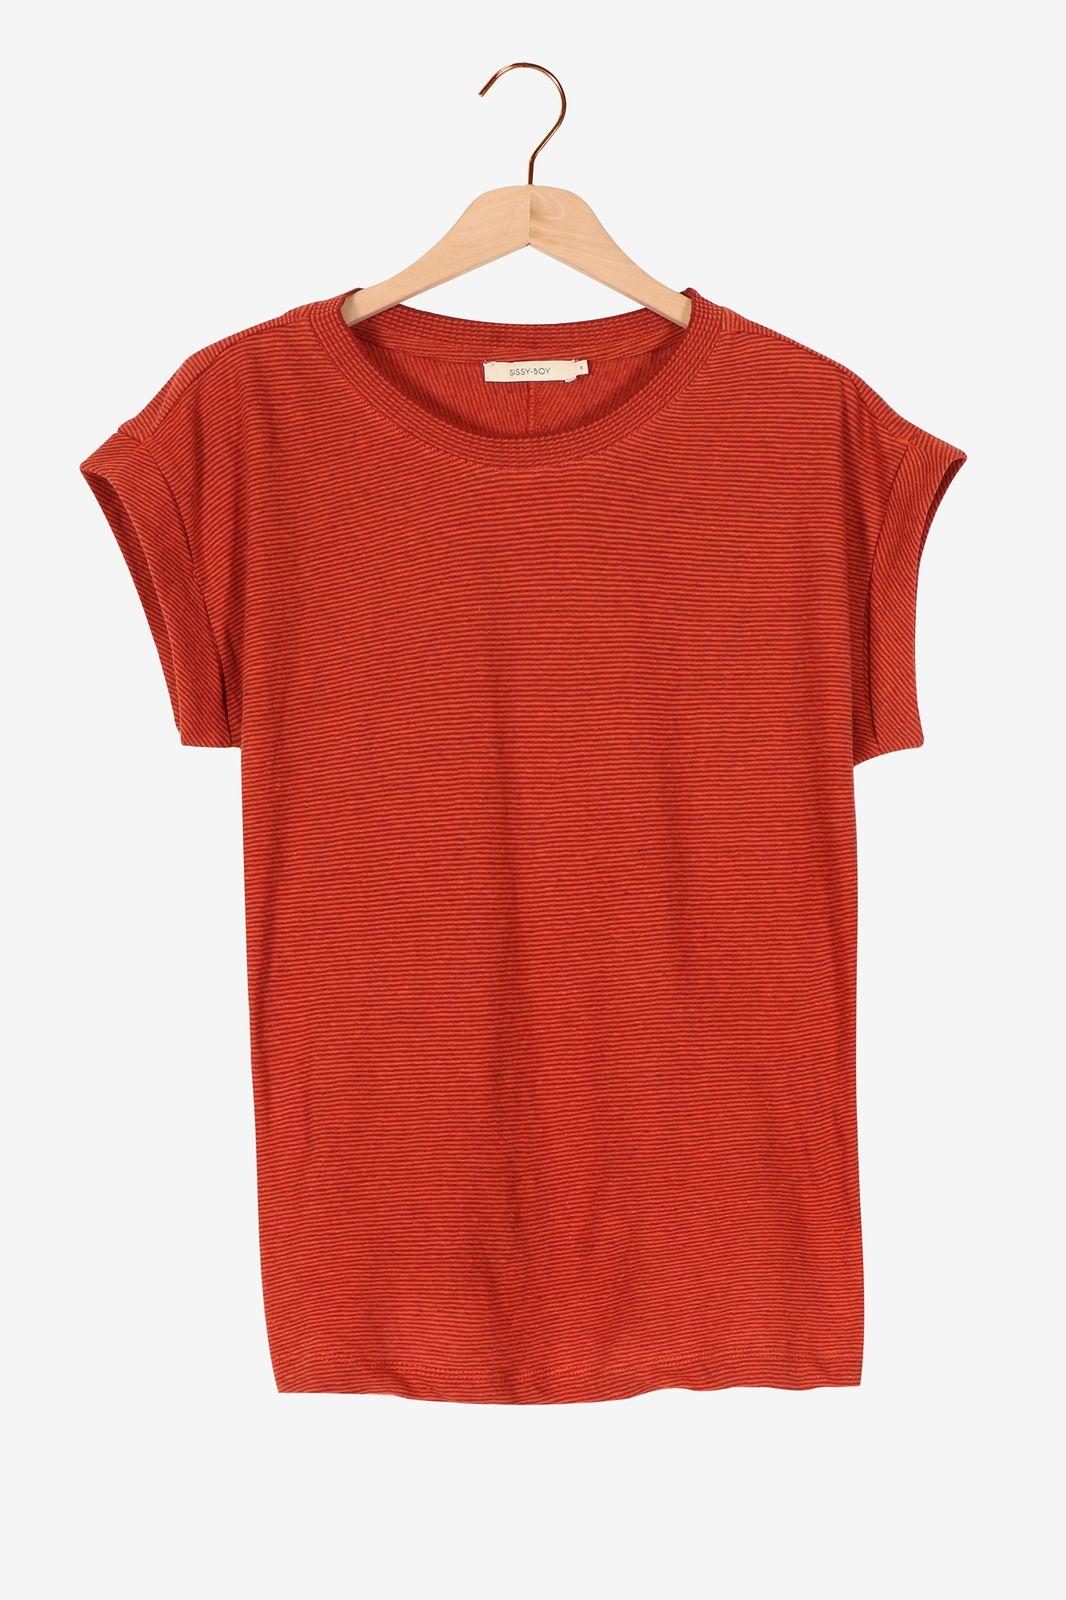 Donkerrood t-shirt gestreept - Dames   Sissy-Boy